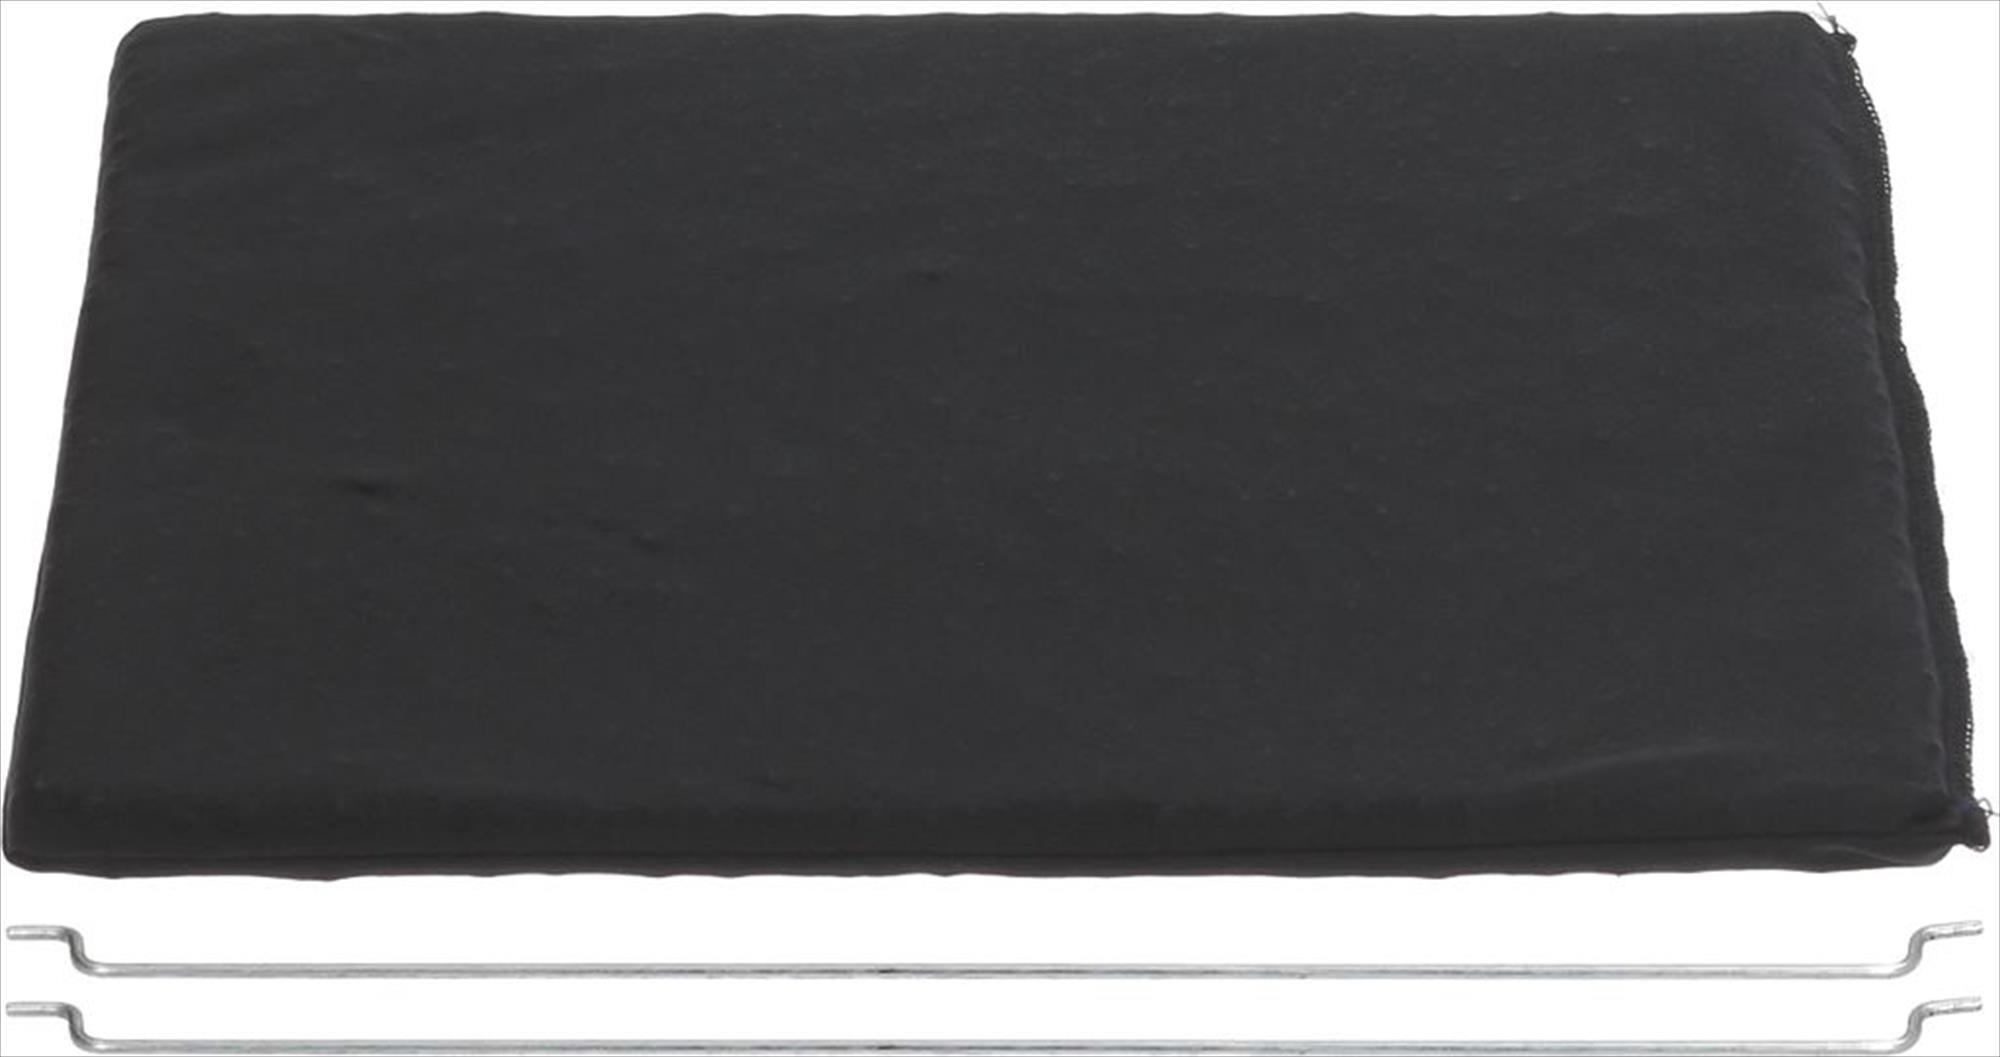 elica wasbare koolstoffilter voor afzuigkap f00439. Black Bedroom Furniture Sets. Home Design Ideas